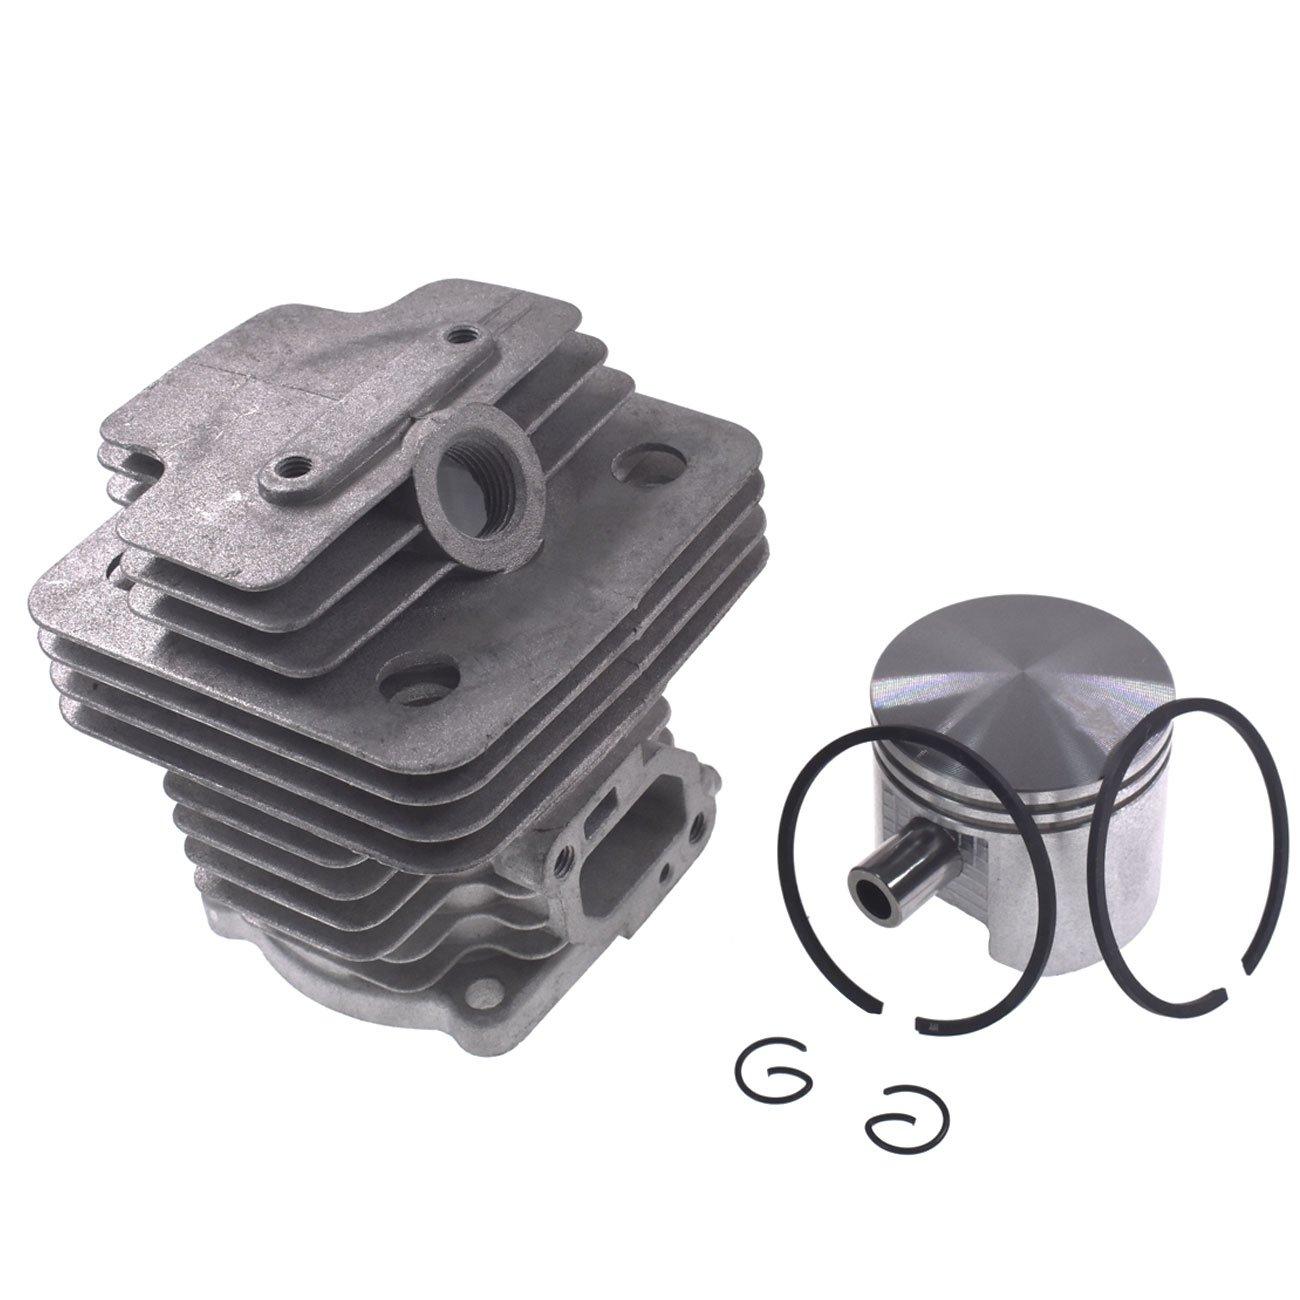 Amazon.com: JRL For Echo SRM-4605 Cylinder Piston 10000043231, P021015770,  P021015771: Garden & Outdoor